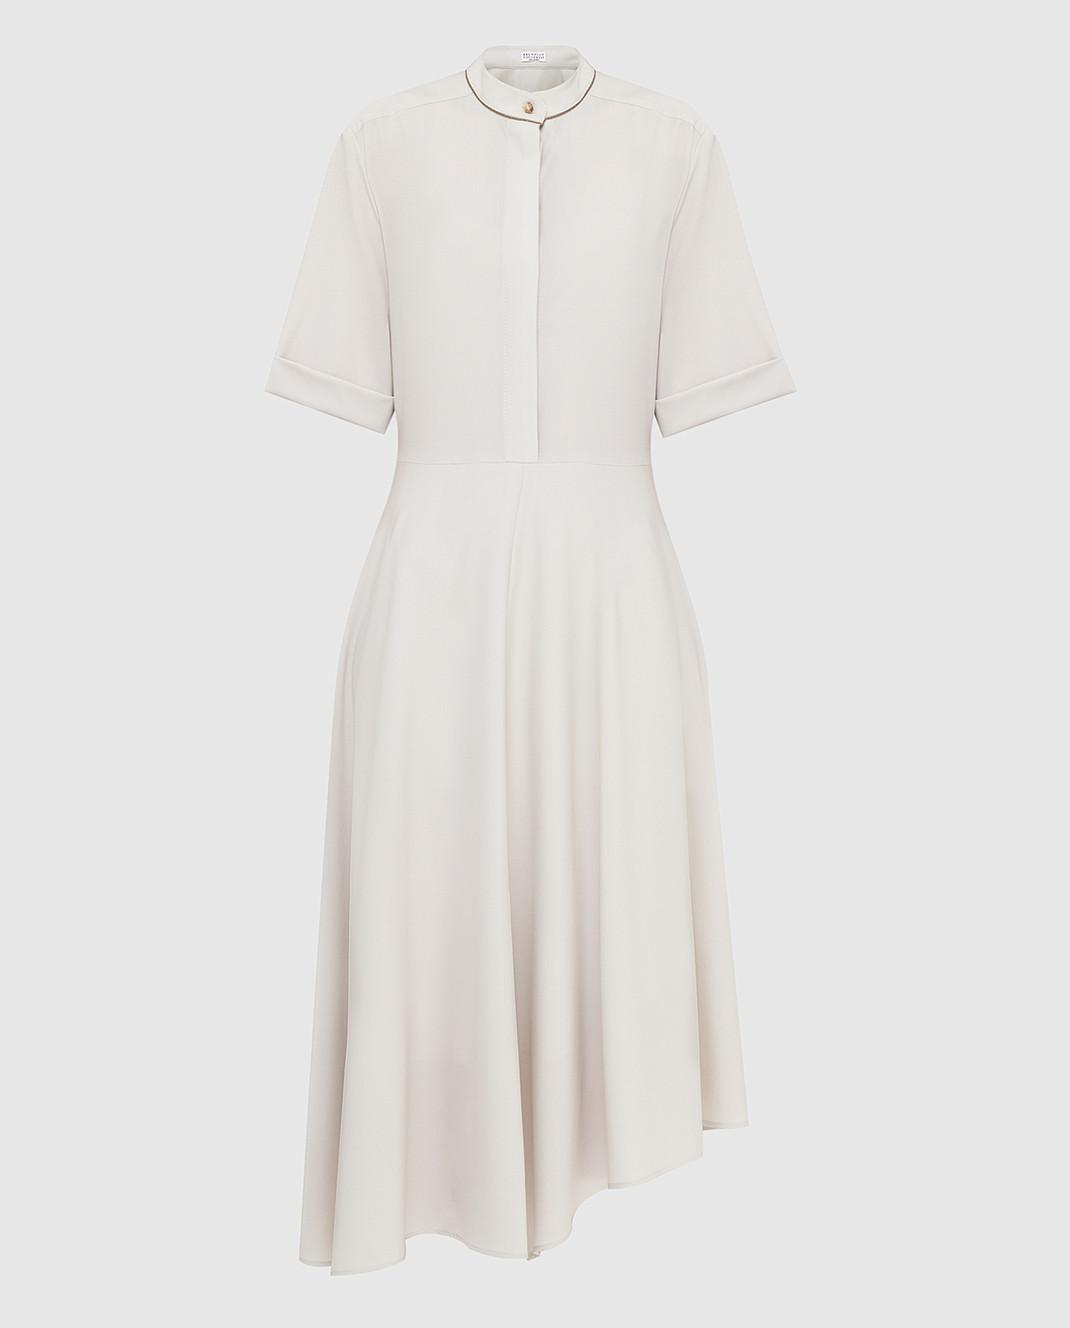 Brunello Cucinelli Светло-бежевое платье из шерсти изображение 1